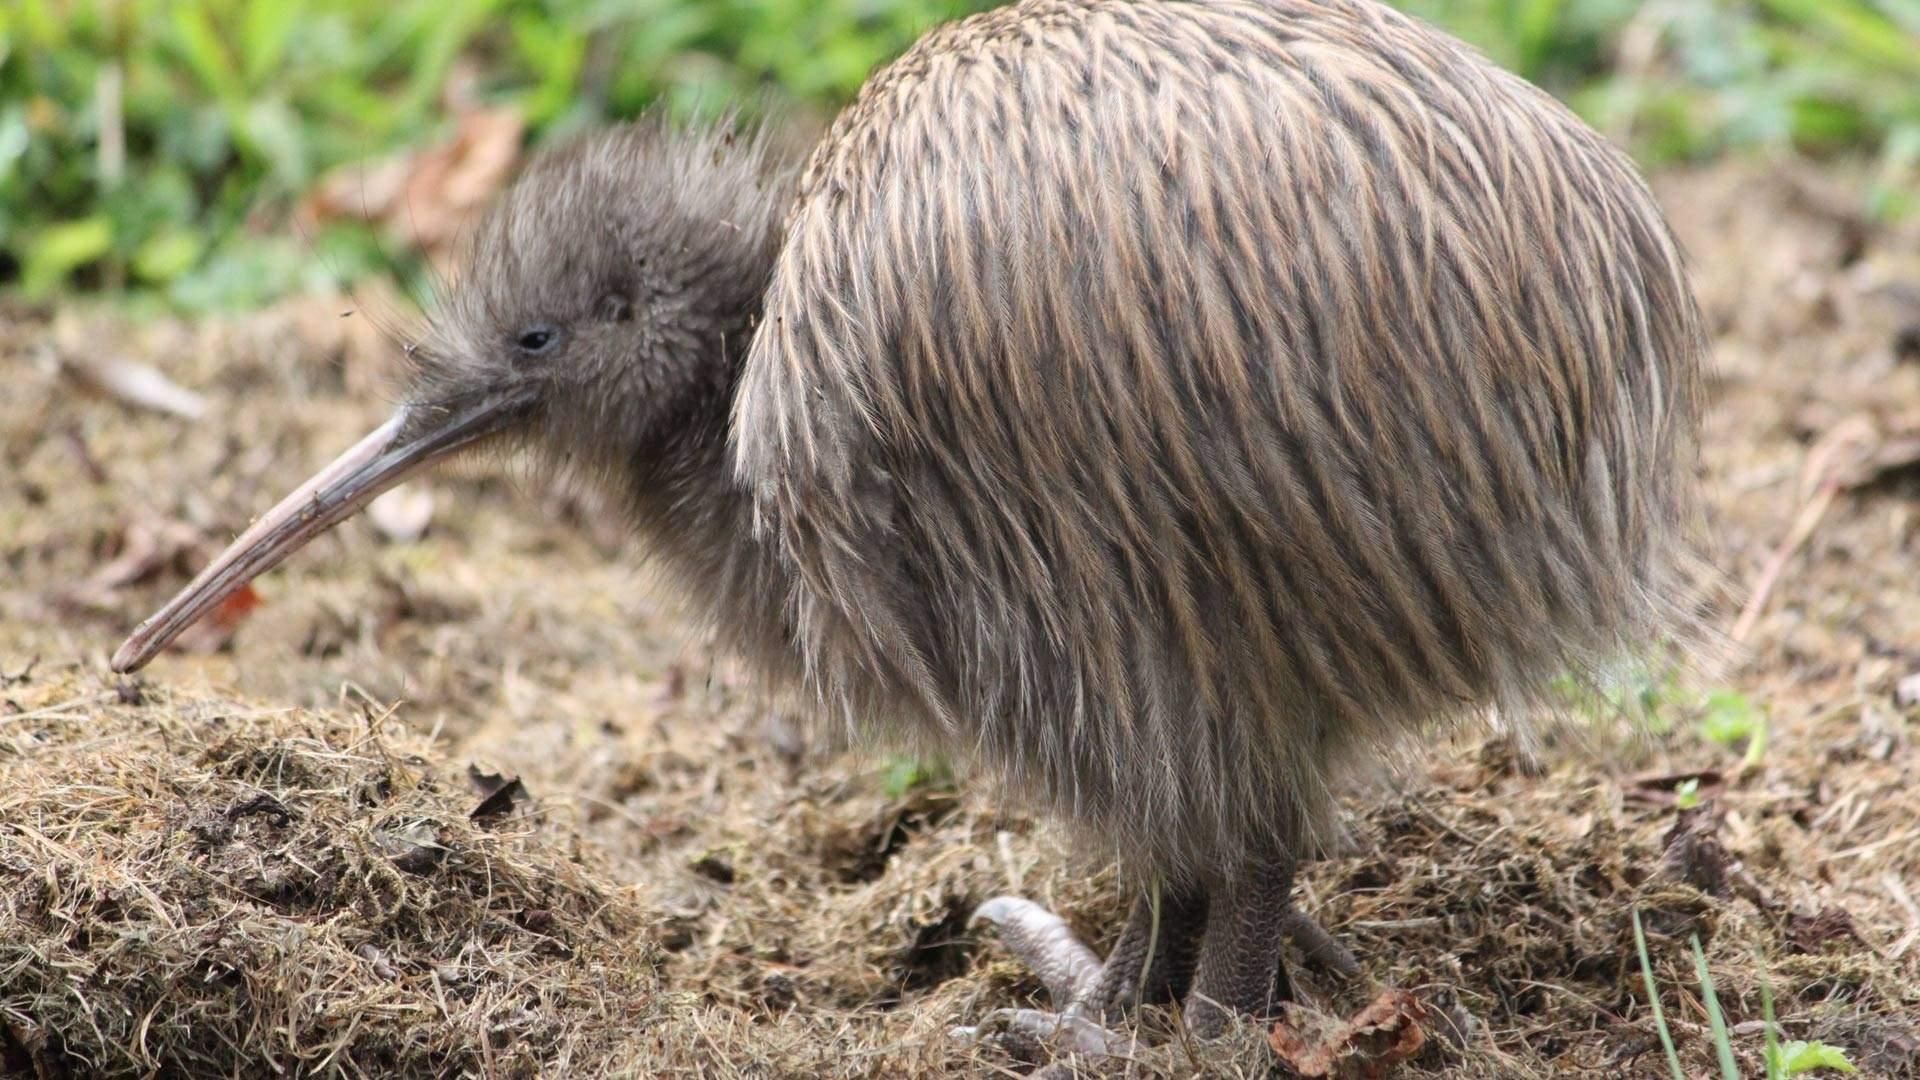 Why are New Zealanders called Kiwis? - Quora